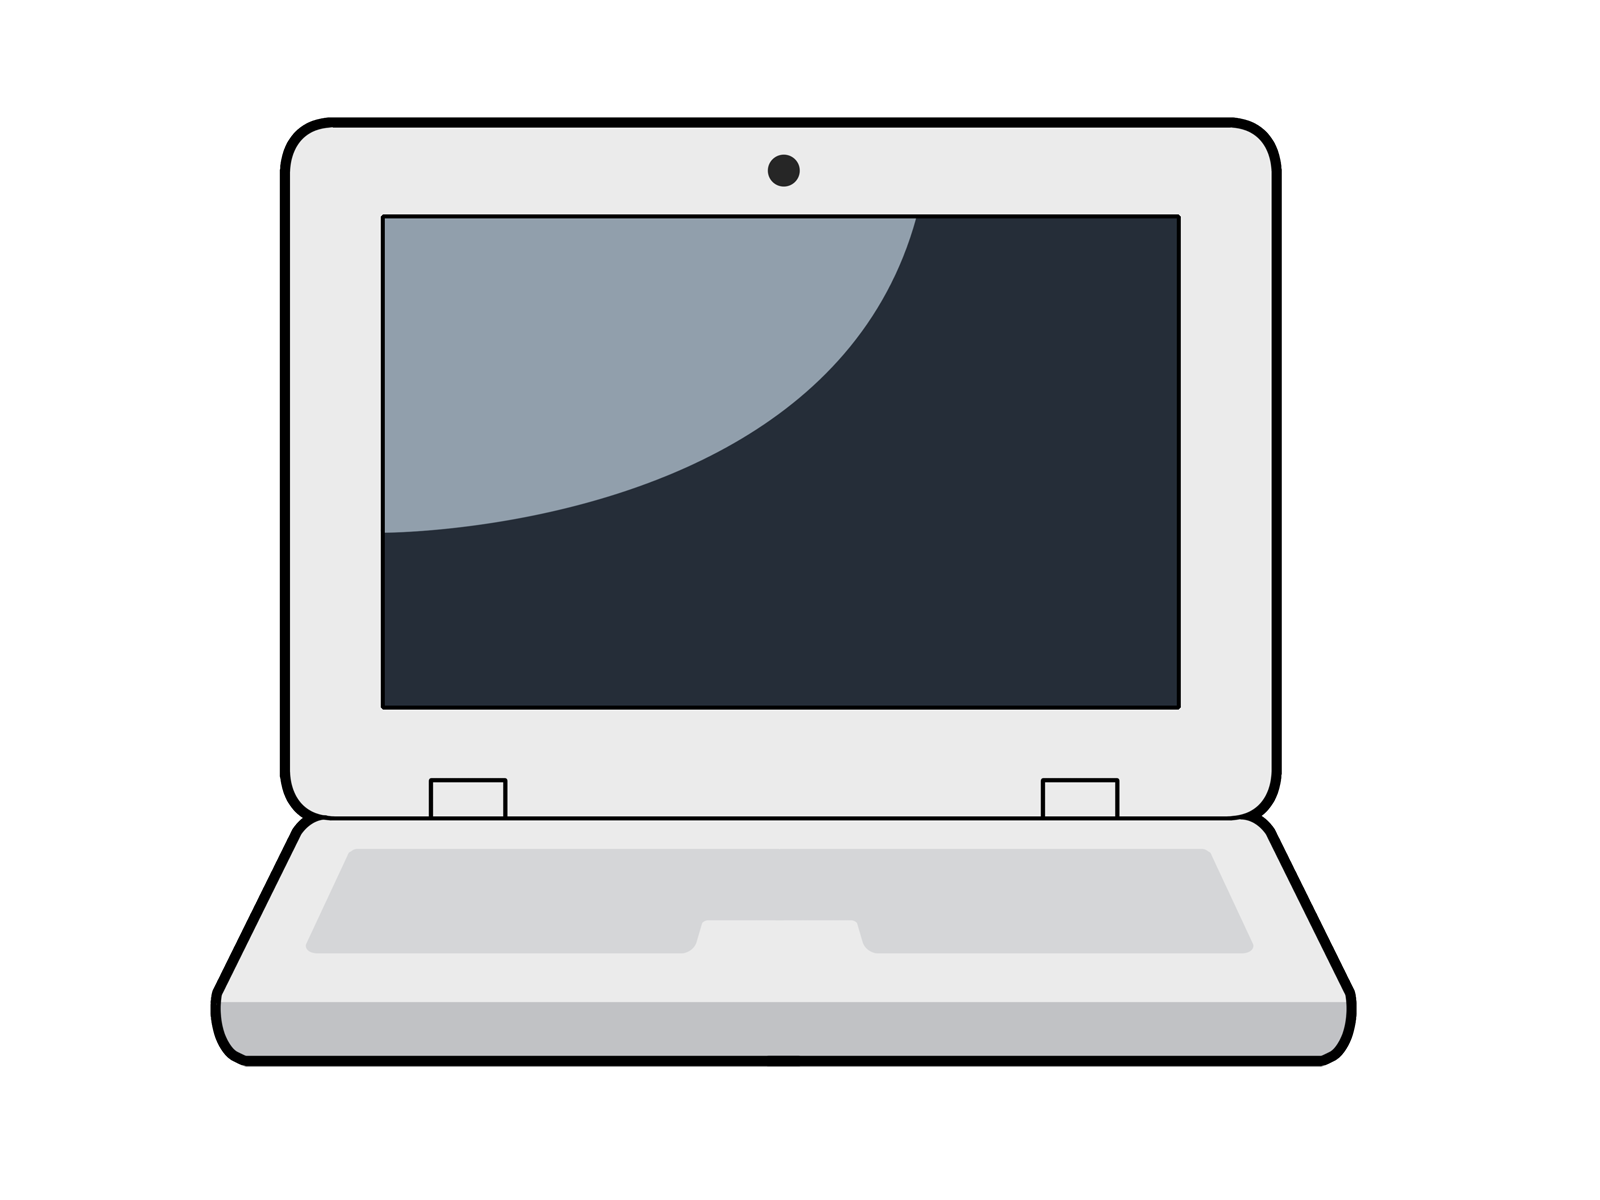 1600x1200 Free To Use Amp Public Domain Laptop Clip Art